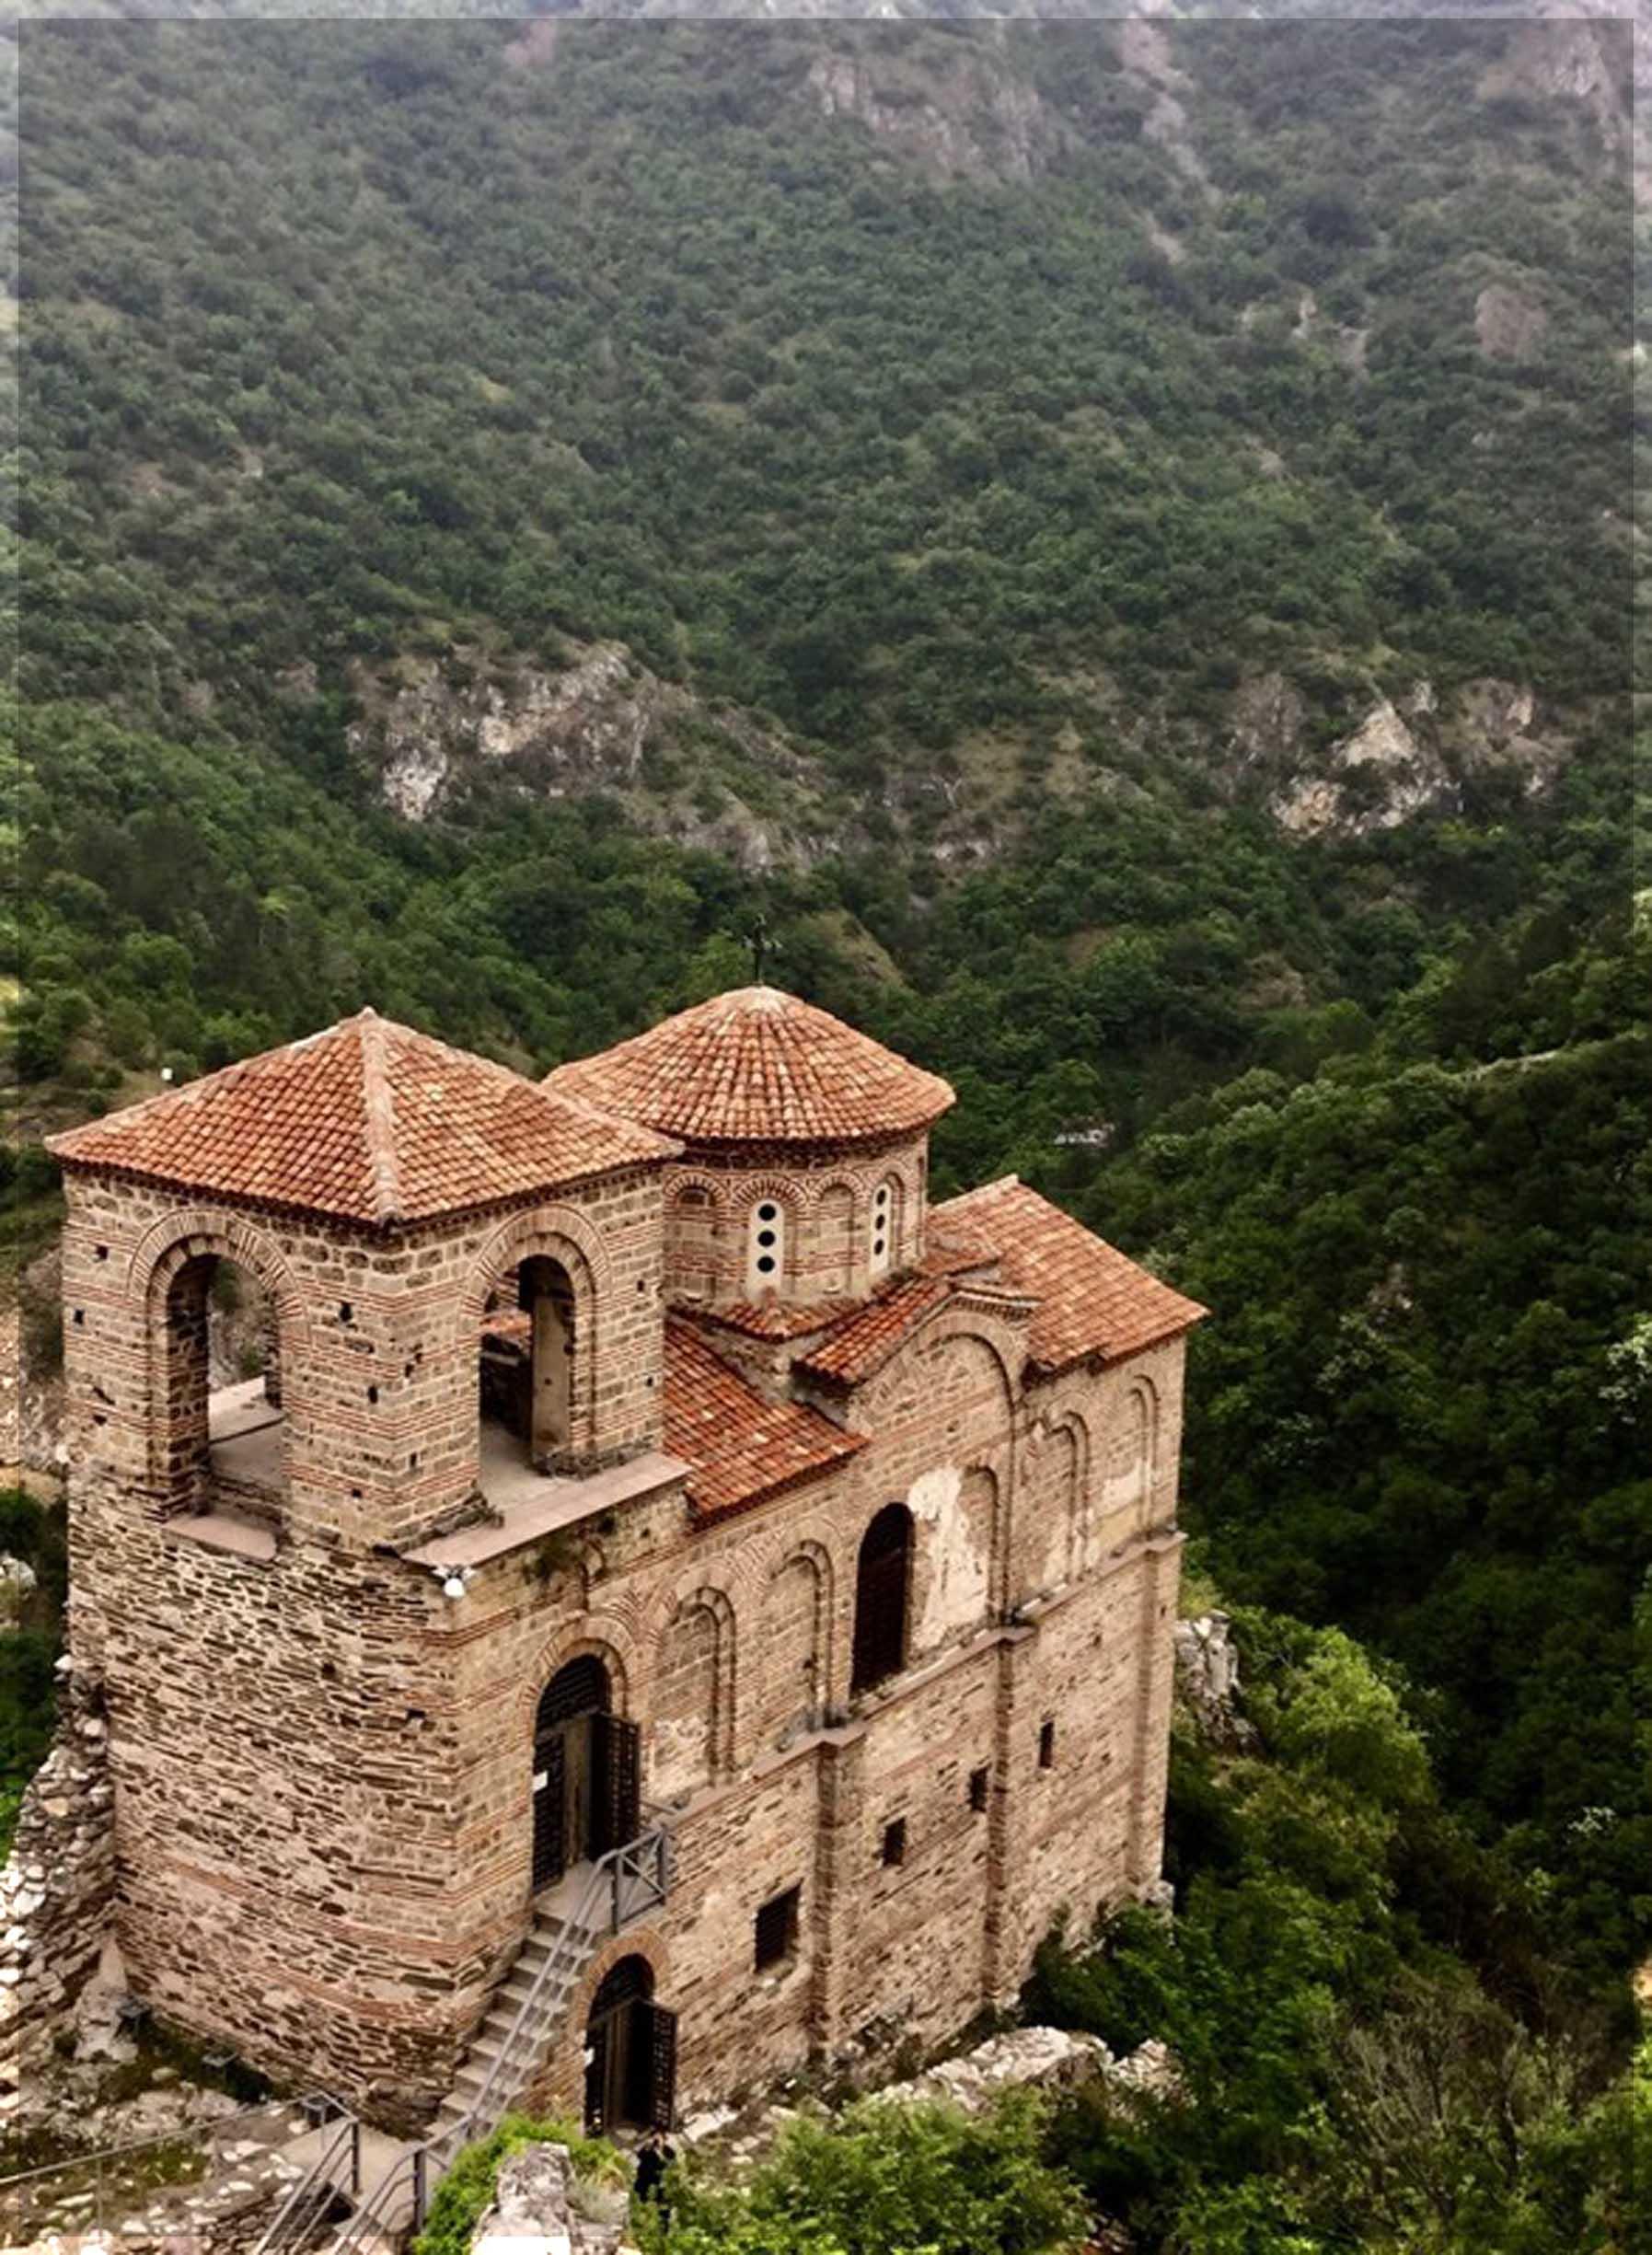 Looking down at a small church